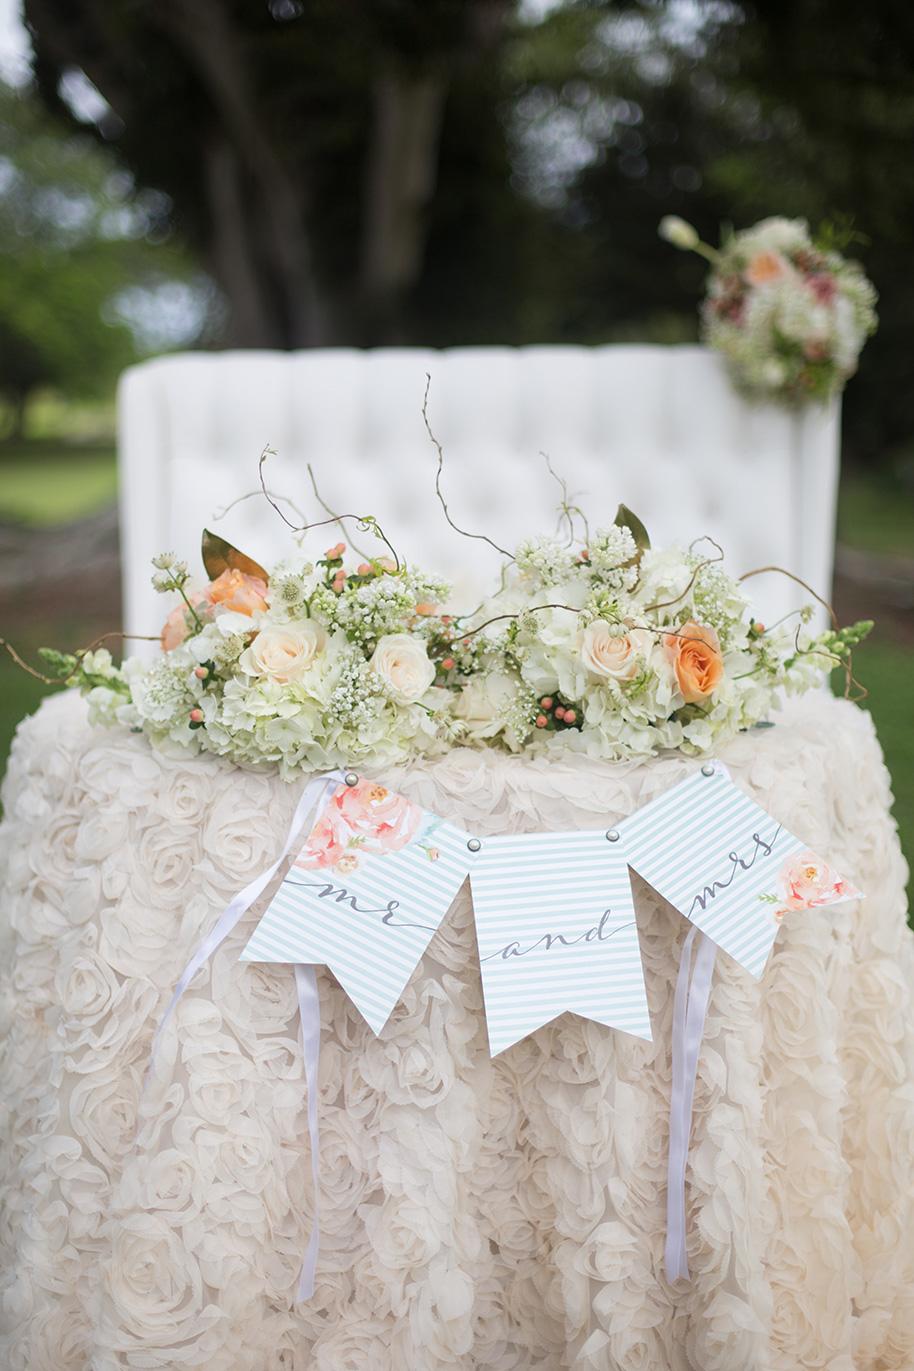 Dillingham-Ranch-Wedding-040516-25